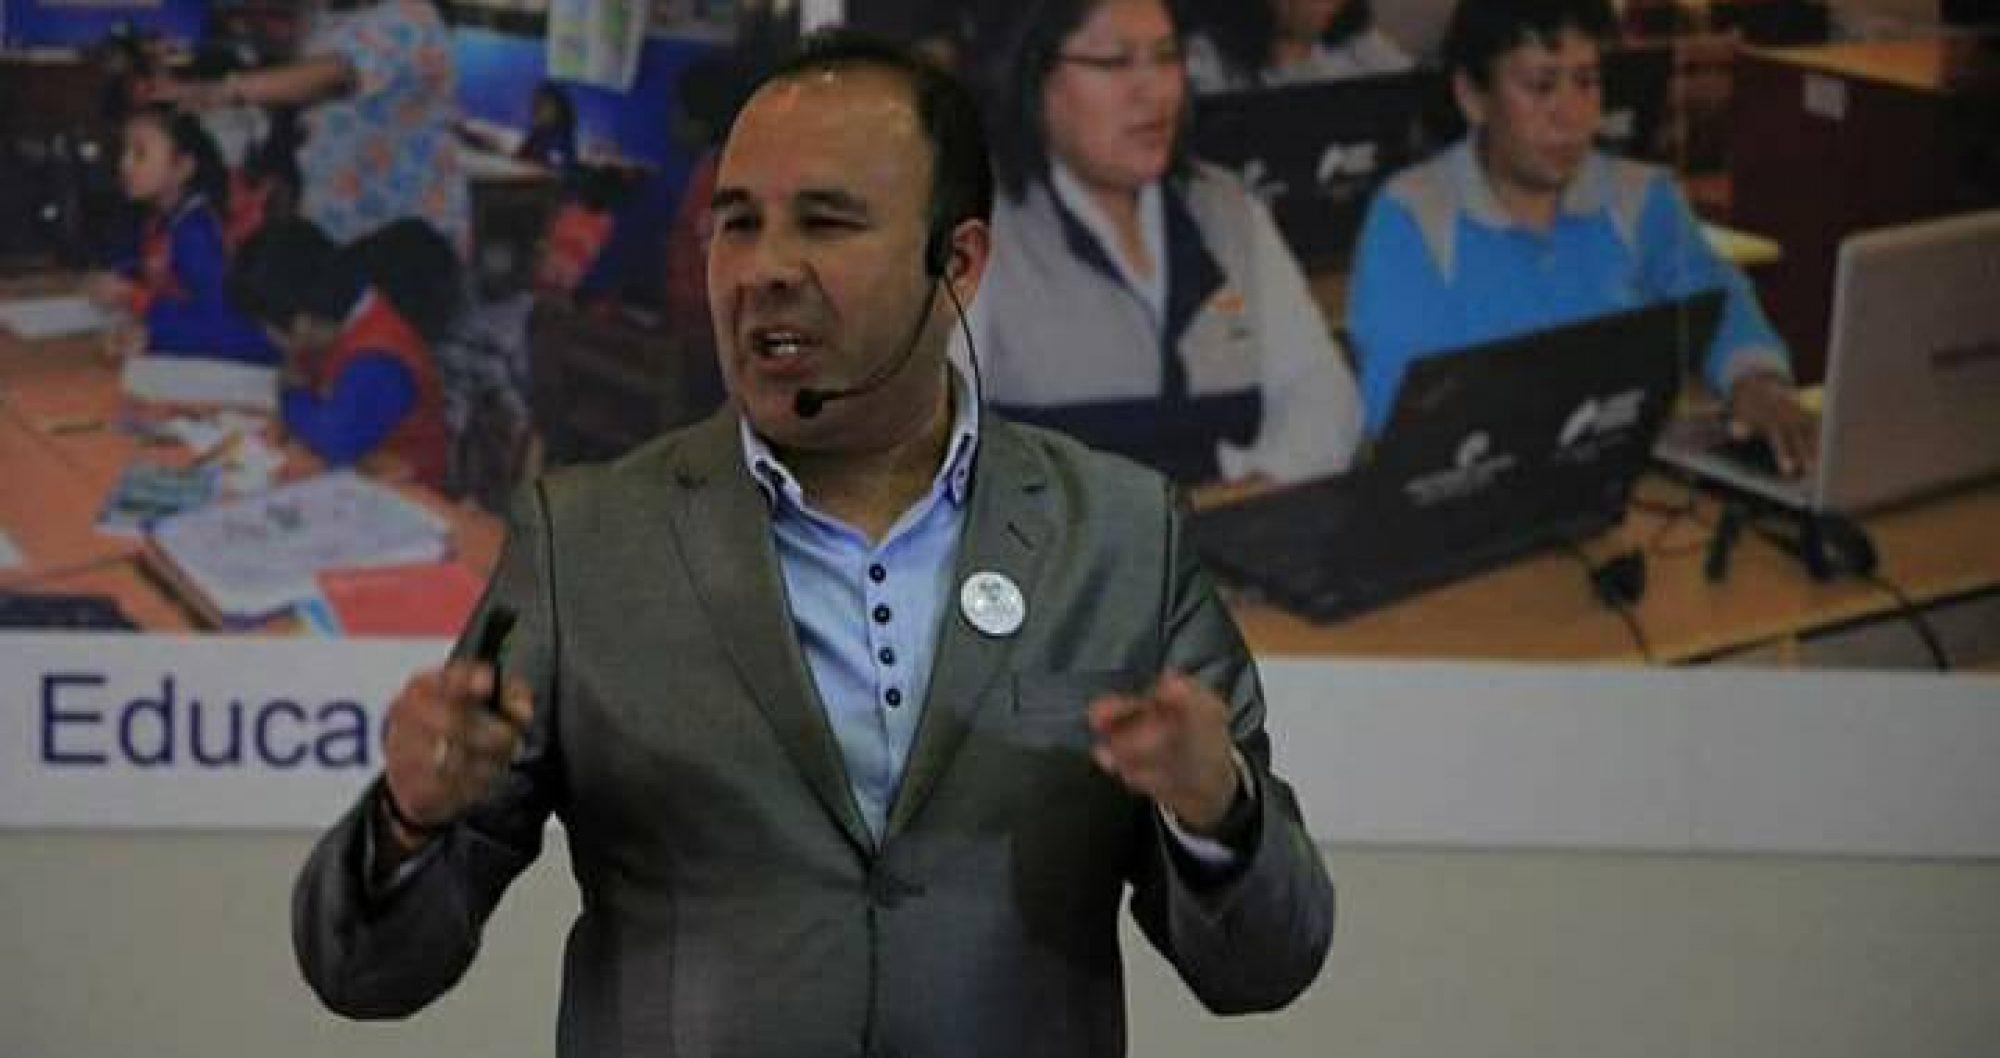 VICTOR ZEGARRA MUÑANTE (Coach & Speaker)